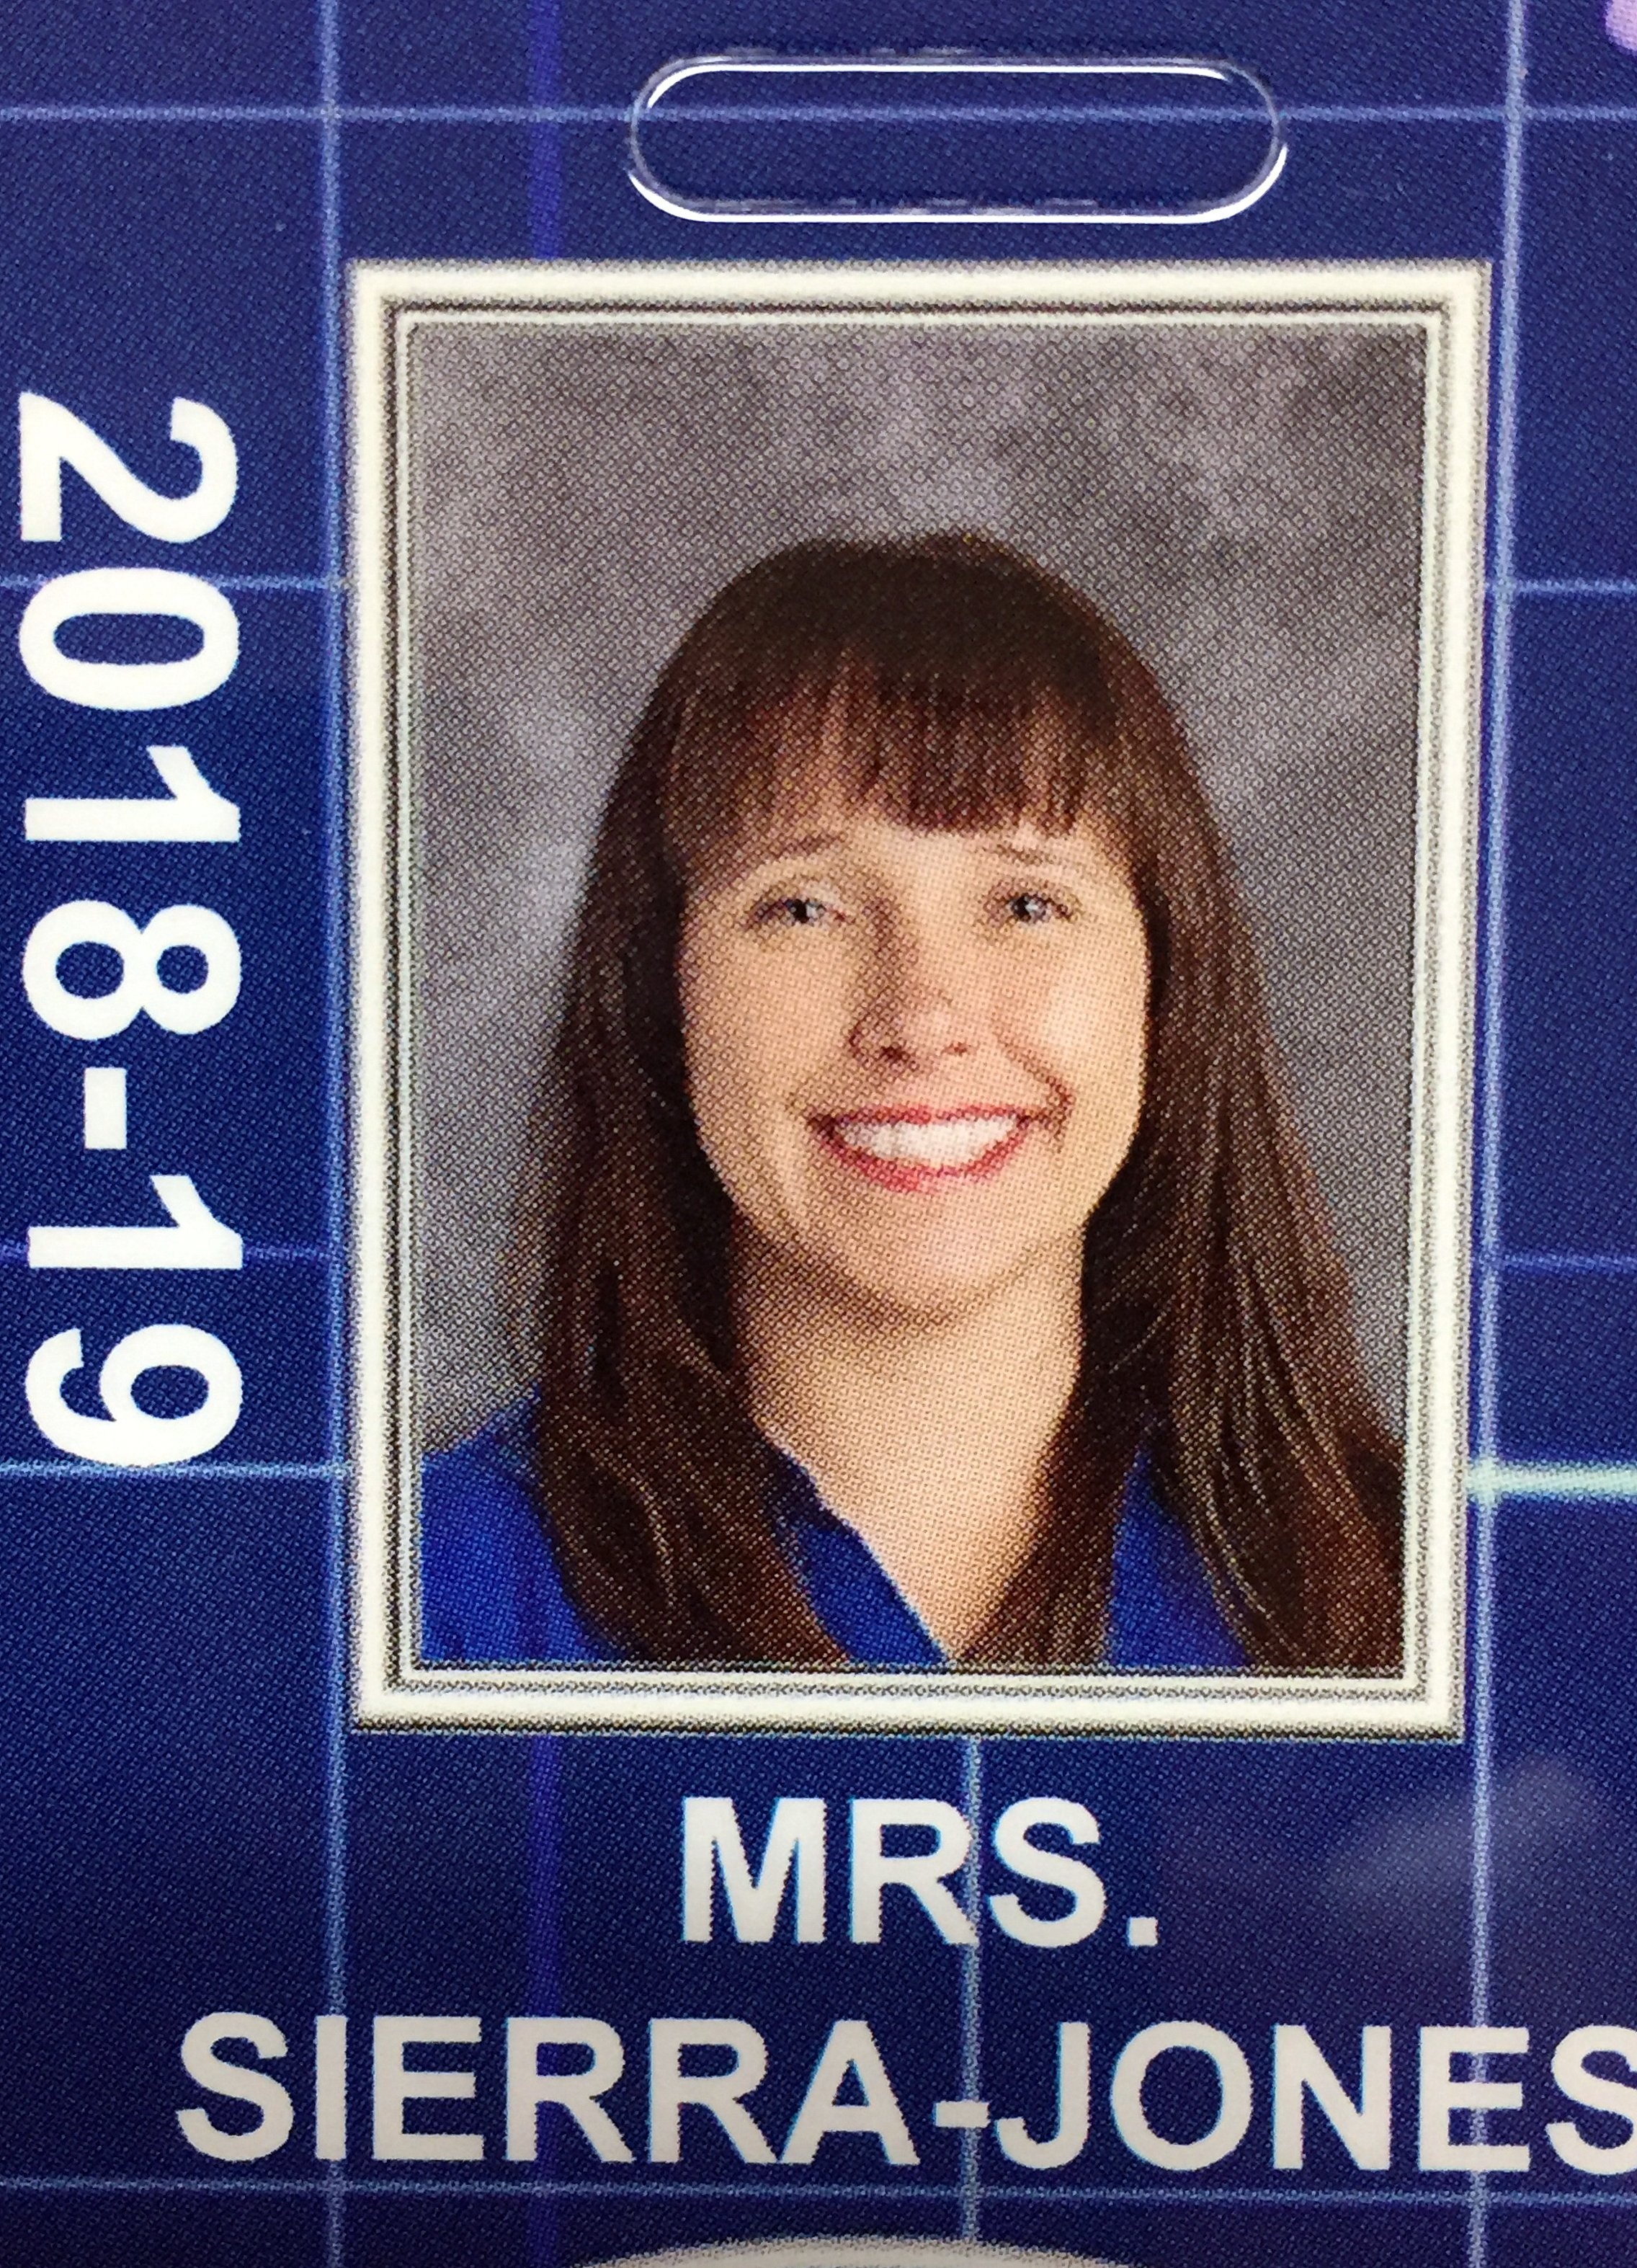 Christina SierraJones School ID